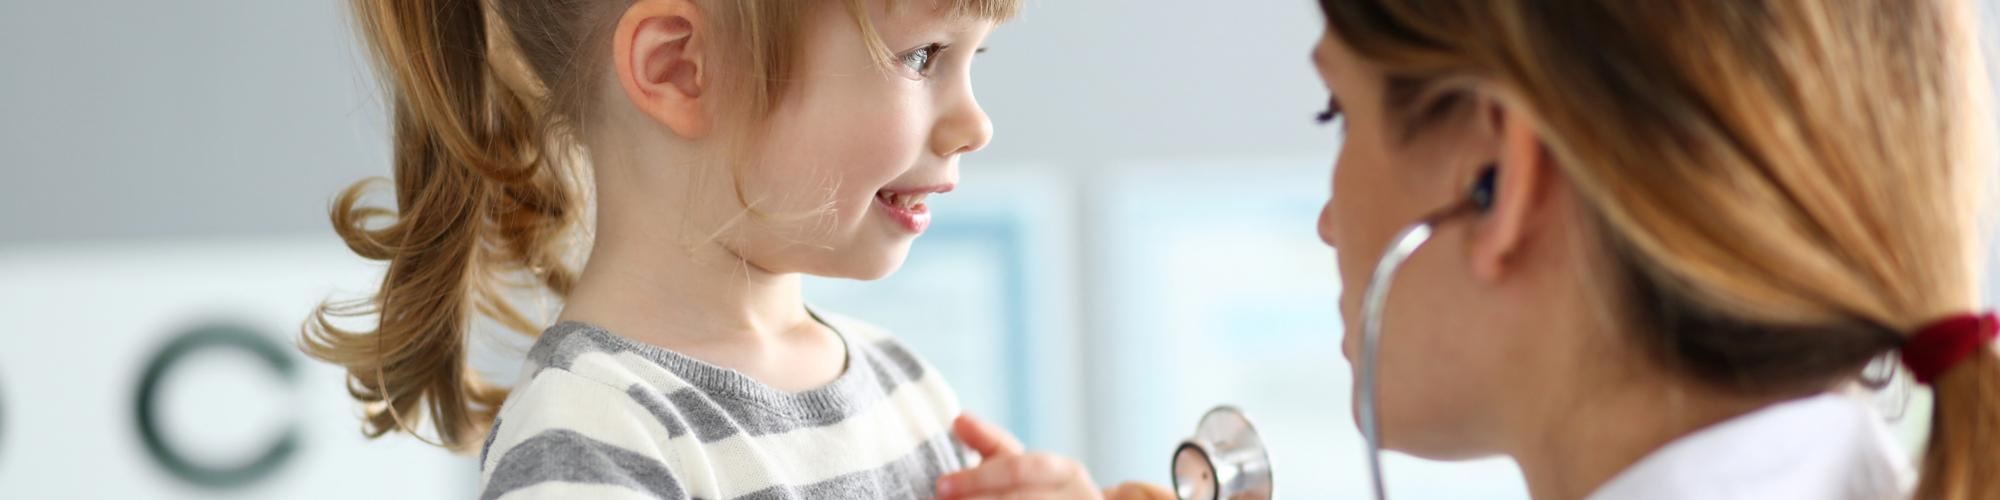 Kinderkompetenzzentrum Dr. Zaknun OG